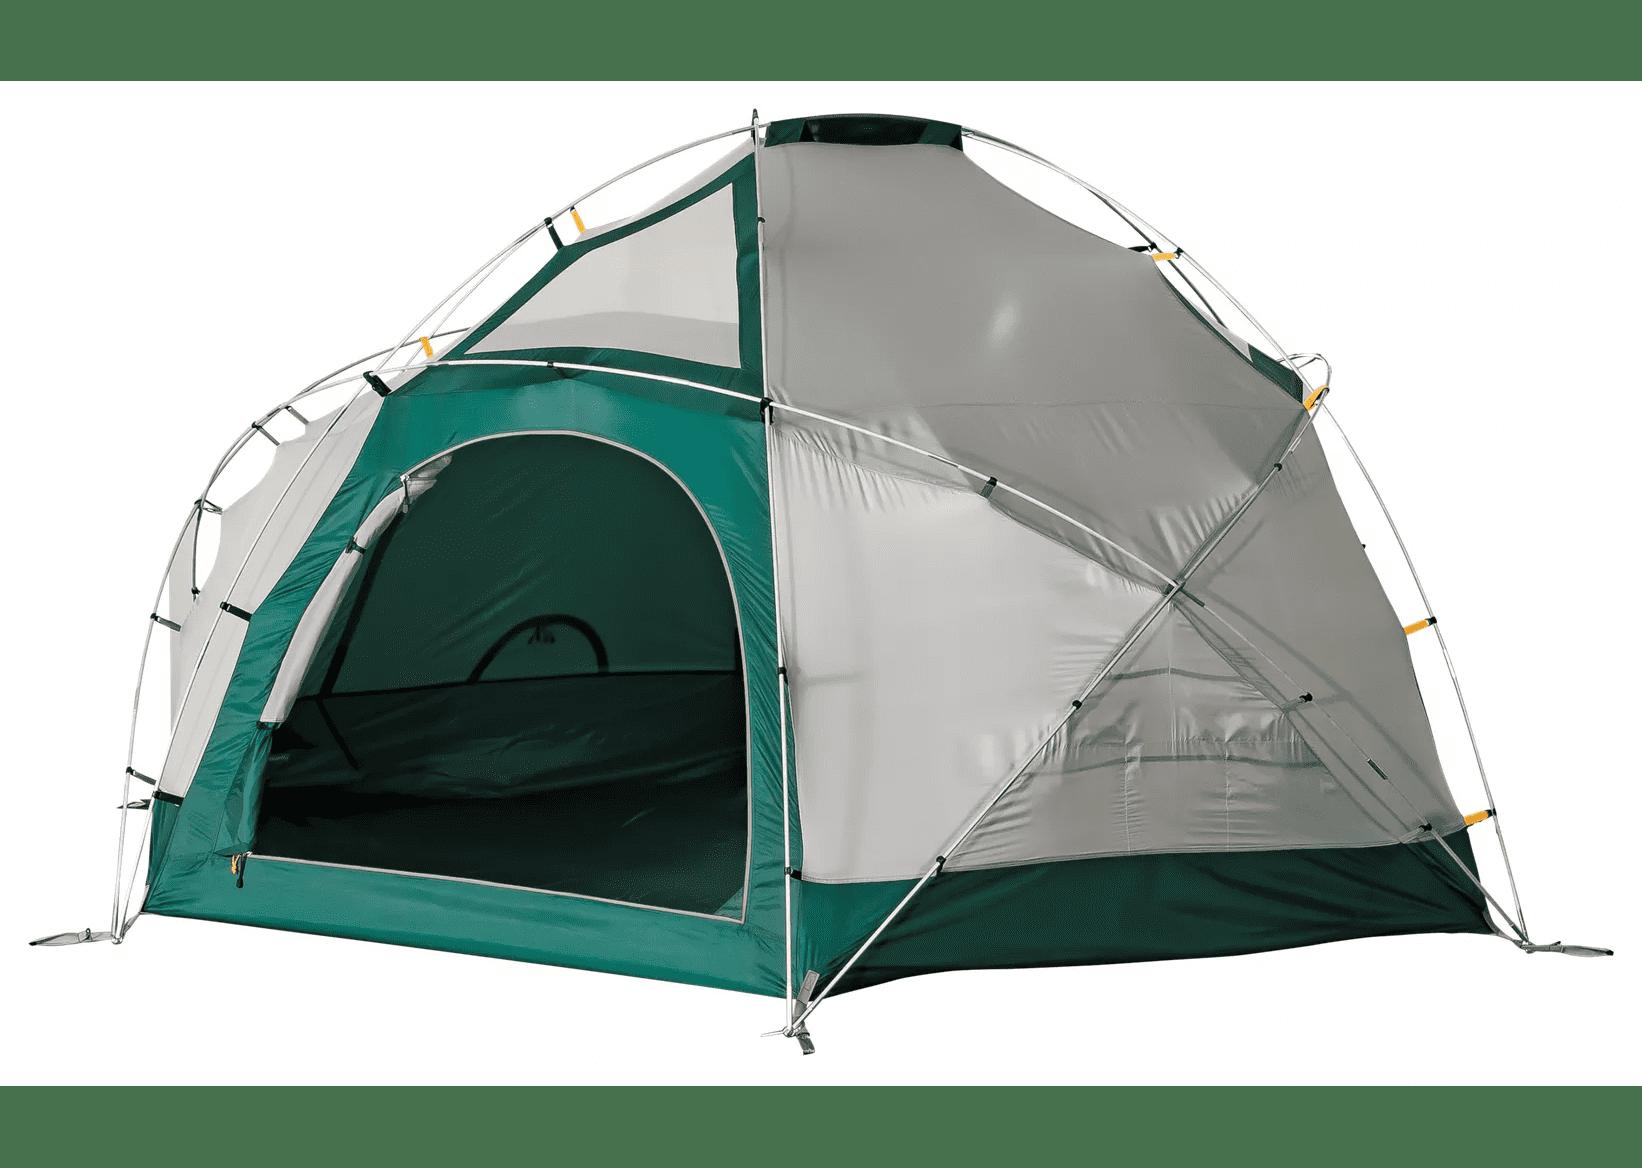 Best Family Waterproof Tent: Alaskan Guide Geodesic 6 Awning